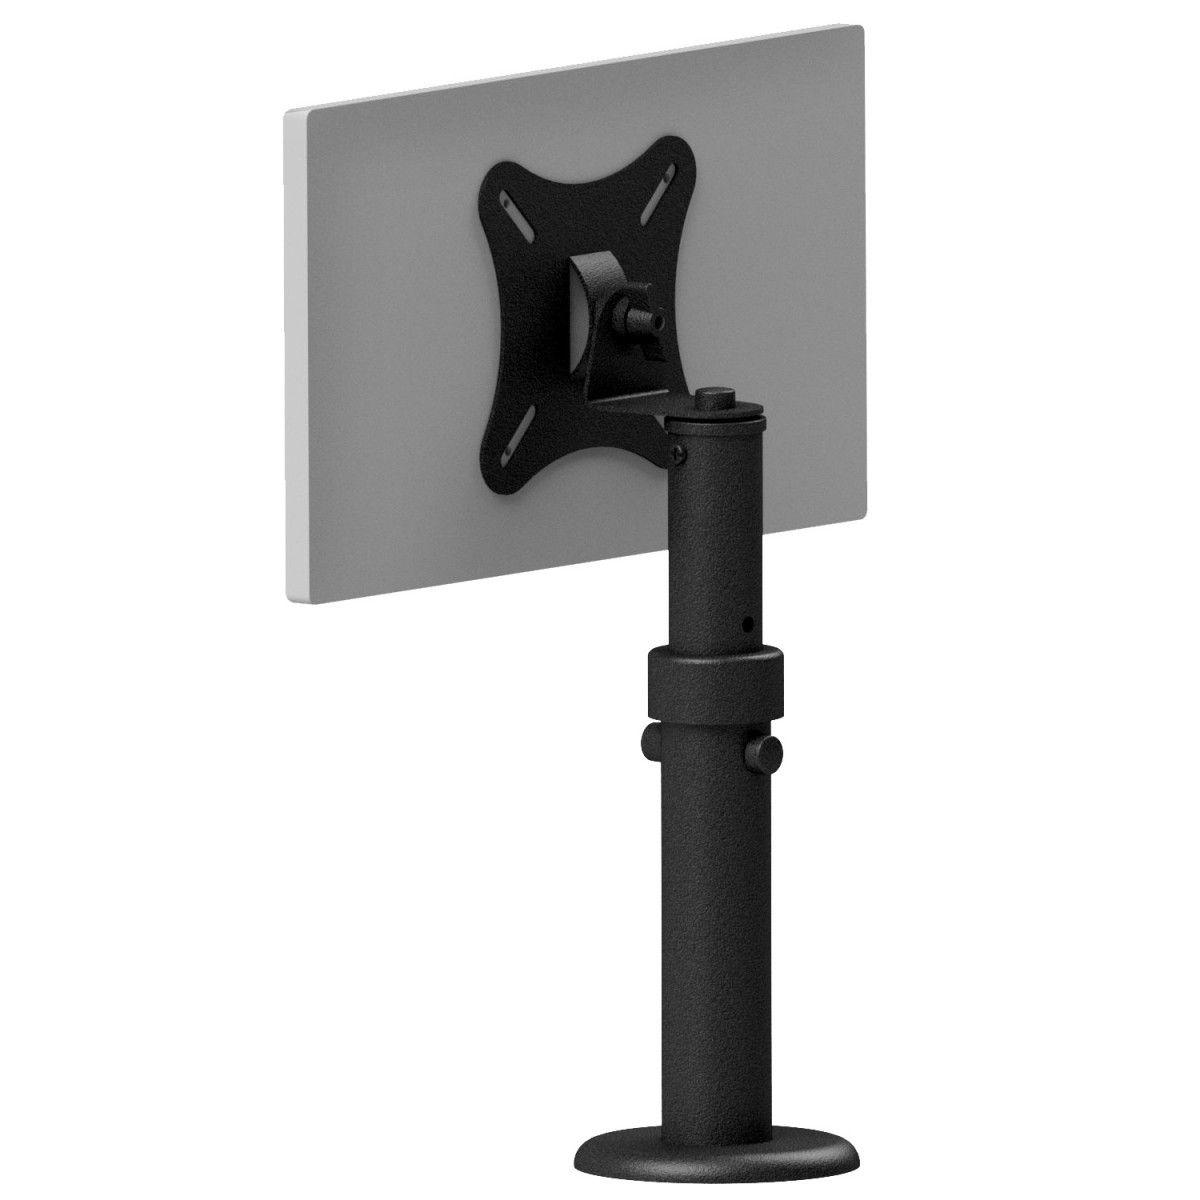 Suporte para Monitor LCD, LED, Wide de 10' a 24' SS-1024